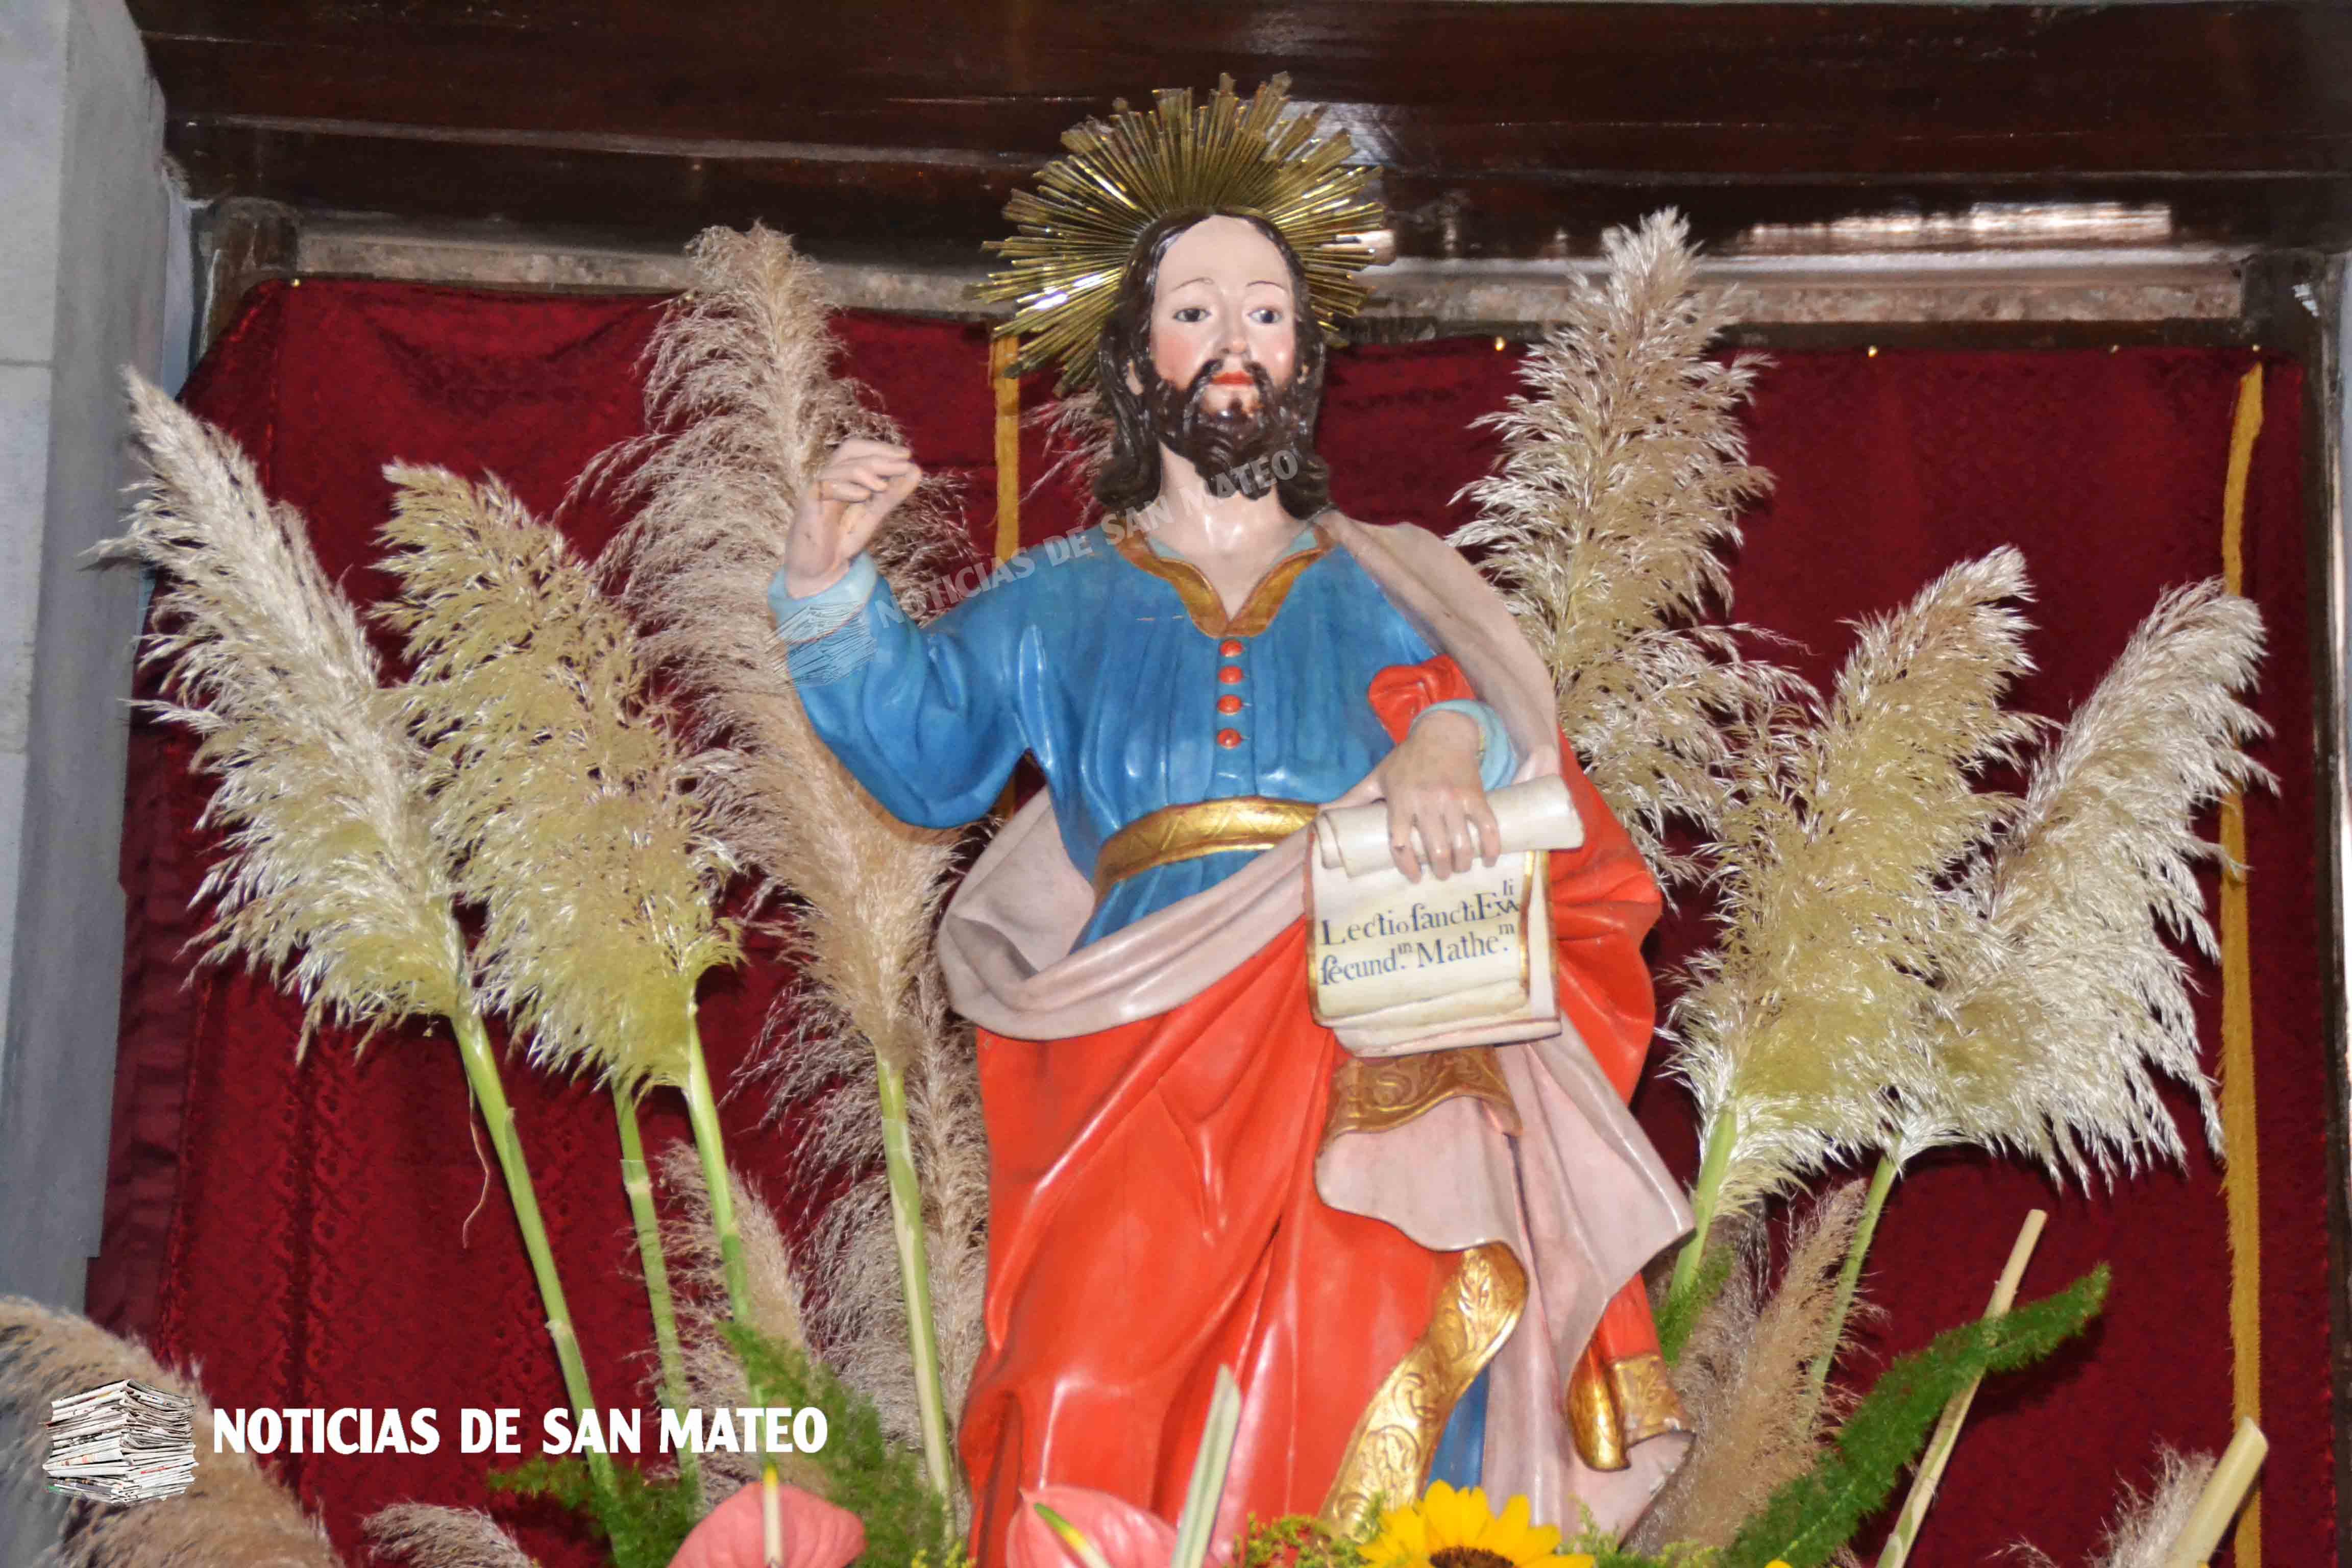 San Mateo Apostol Foto Laura Miranda Noticias de San Mateo